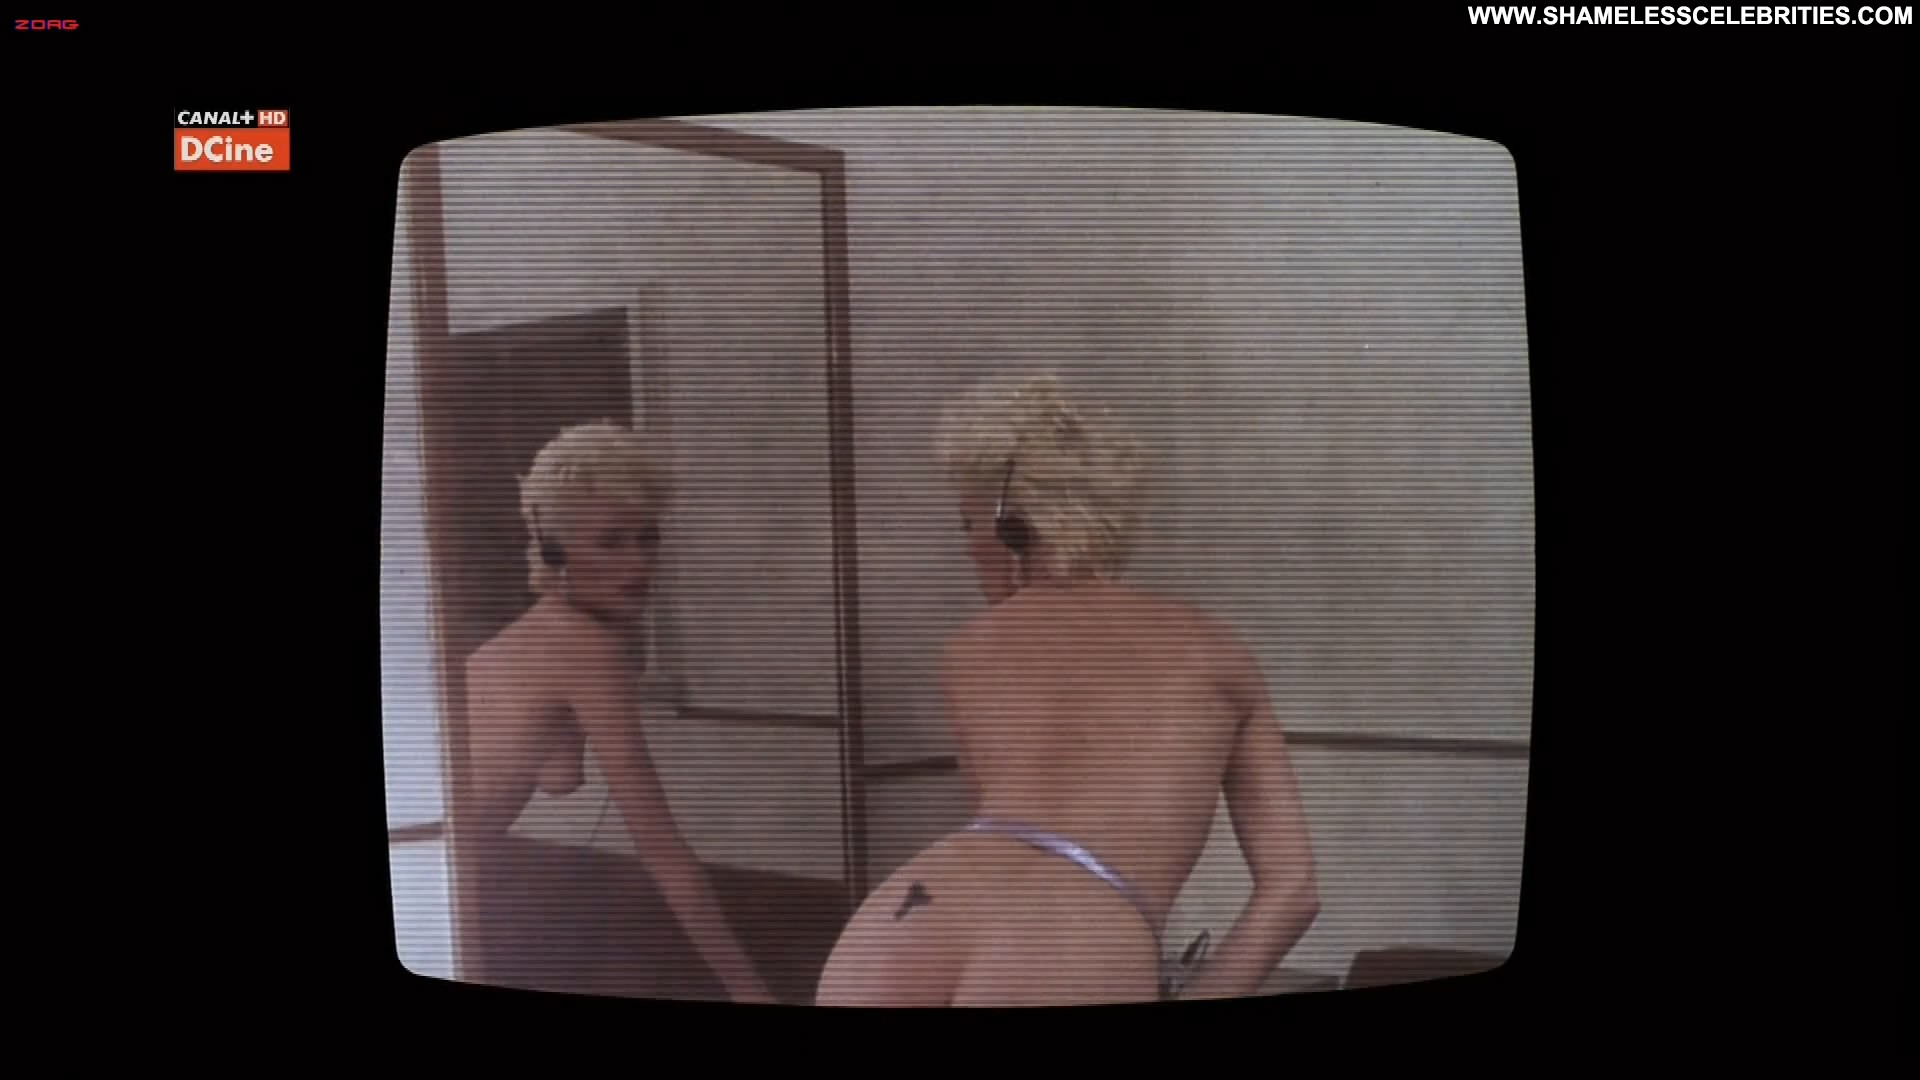 Naked deborah shelton in body double